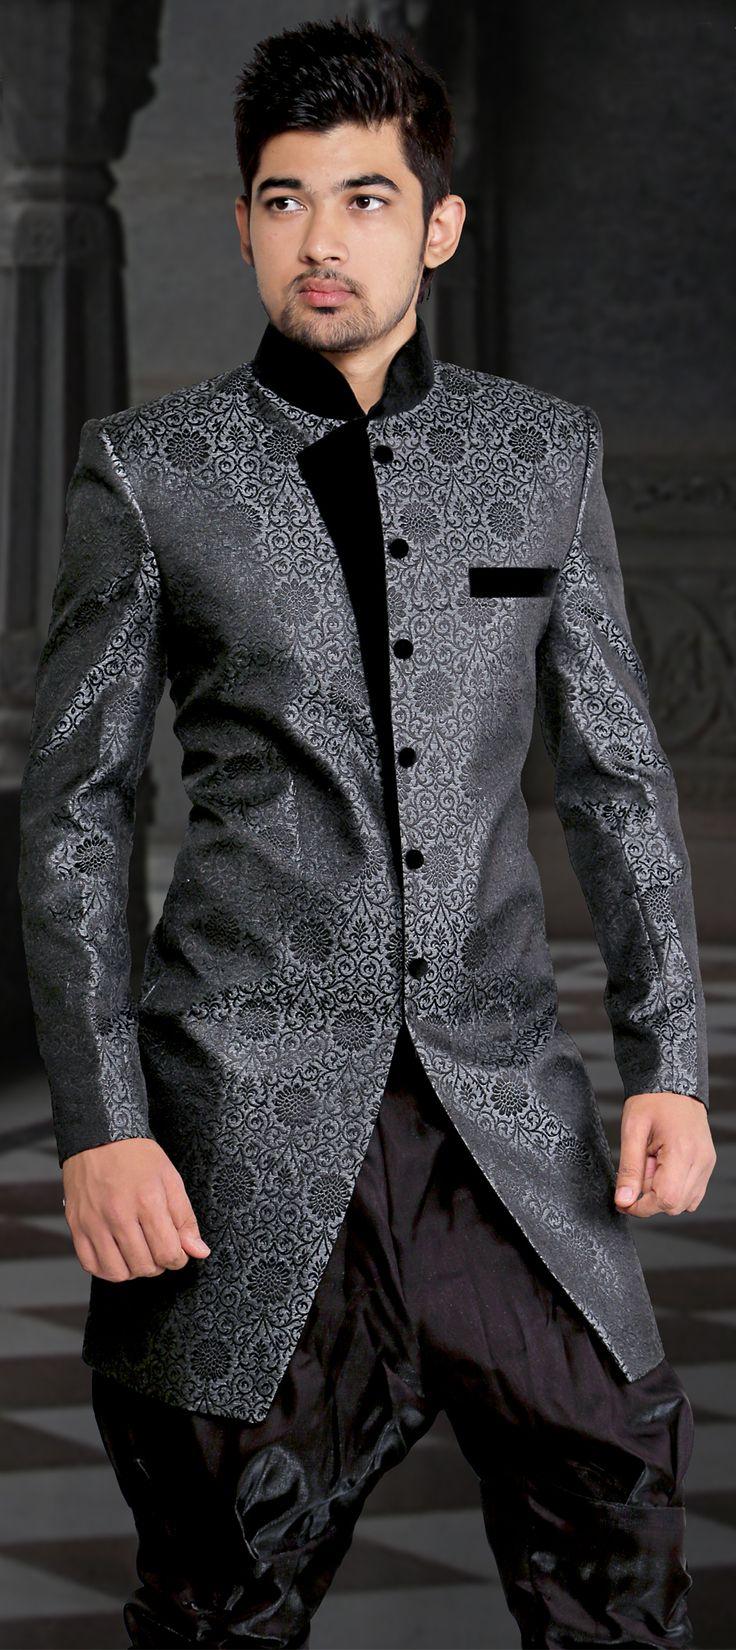 Jacquard IndoWestern Dress in Black and Grey with Patch work  sherwani  Fashion Sherwani Dresses